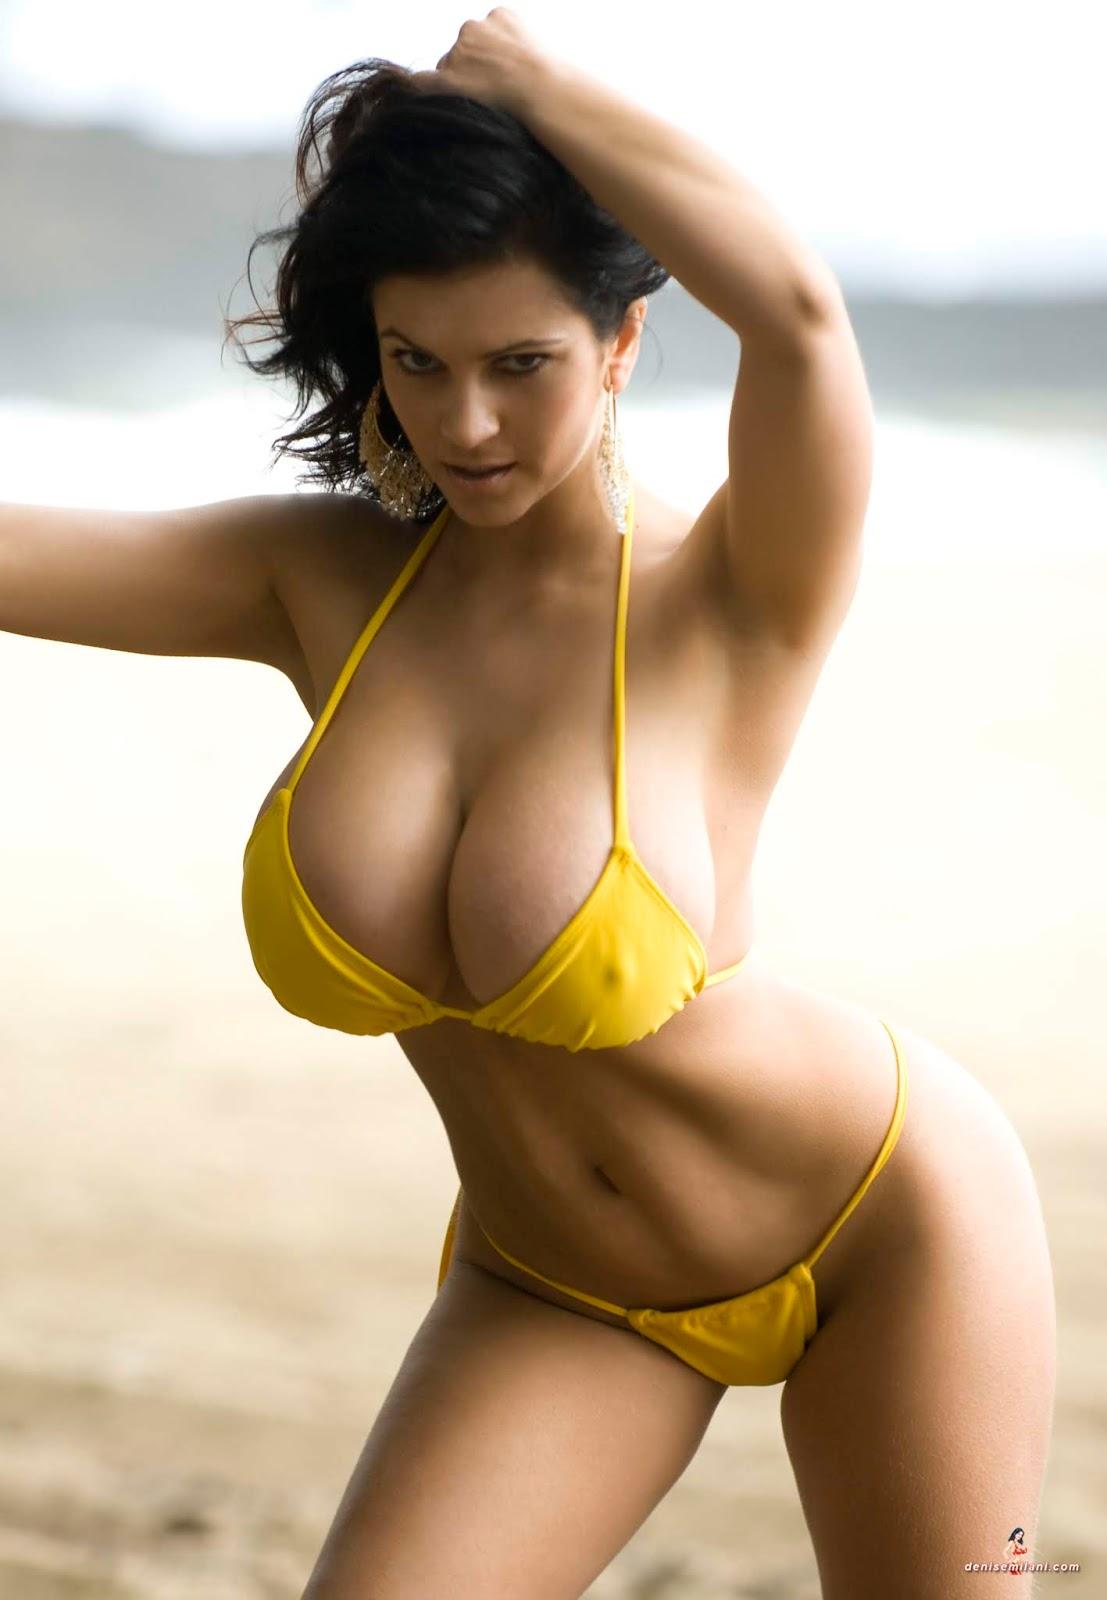 Bikini hot tit, kate deluna nue